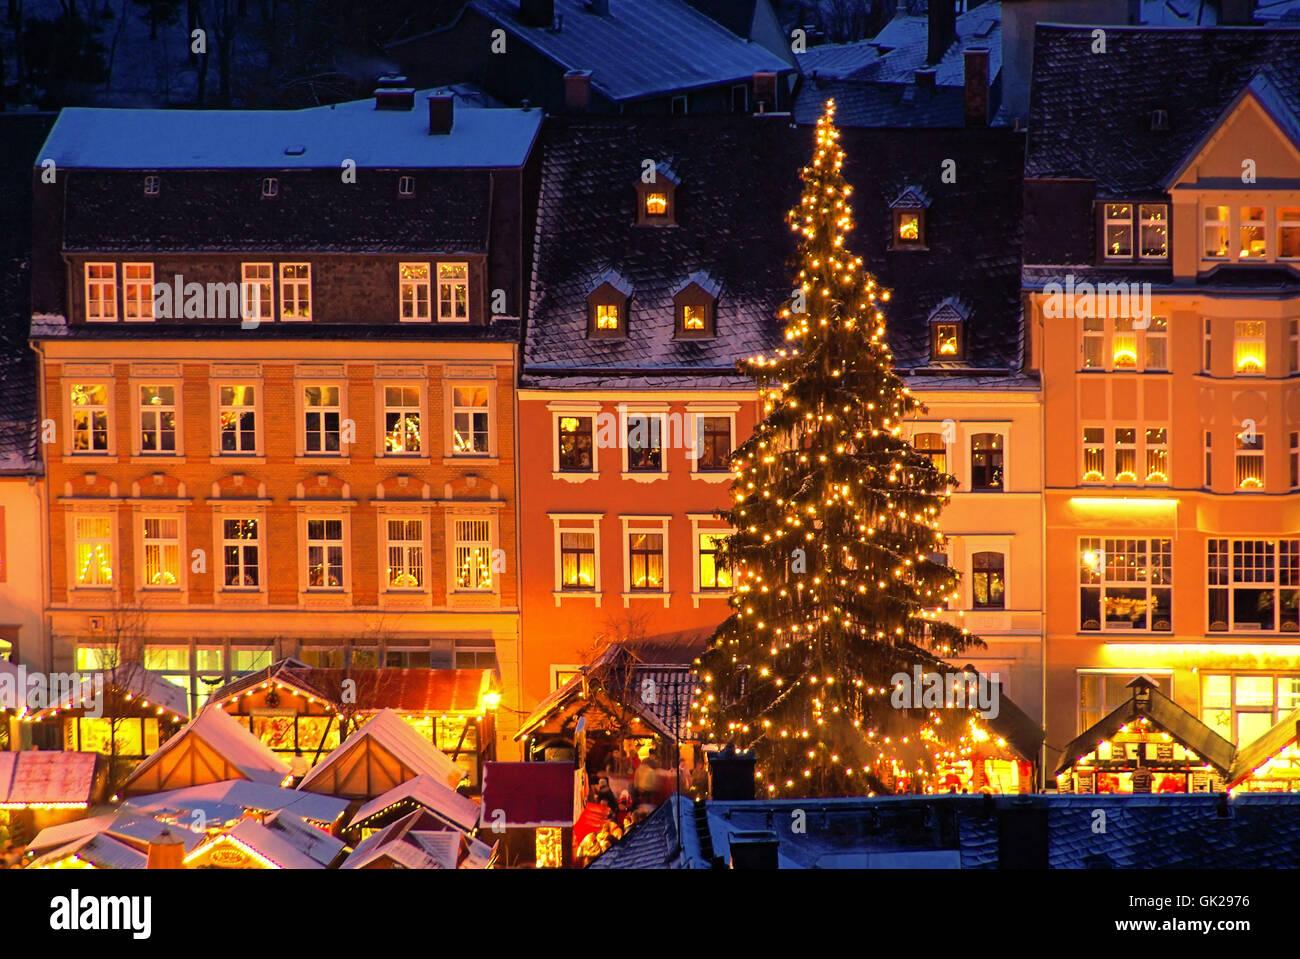 Dagobertshausen Weihnachtsmarkt.Buchholz Stock Photos Buchholz Stock Images Page 2 Alamy